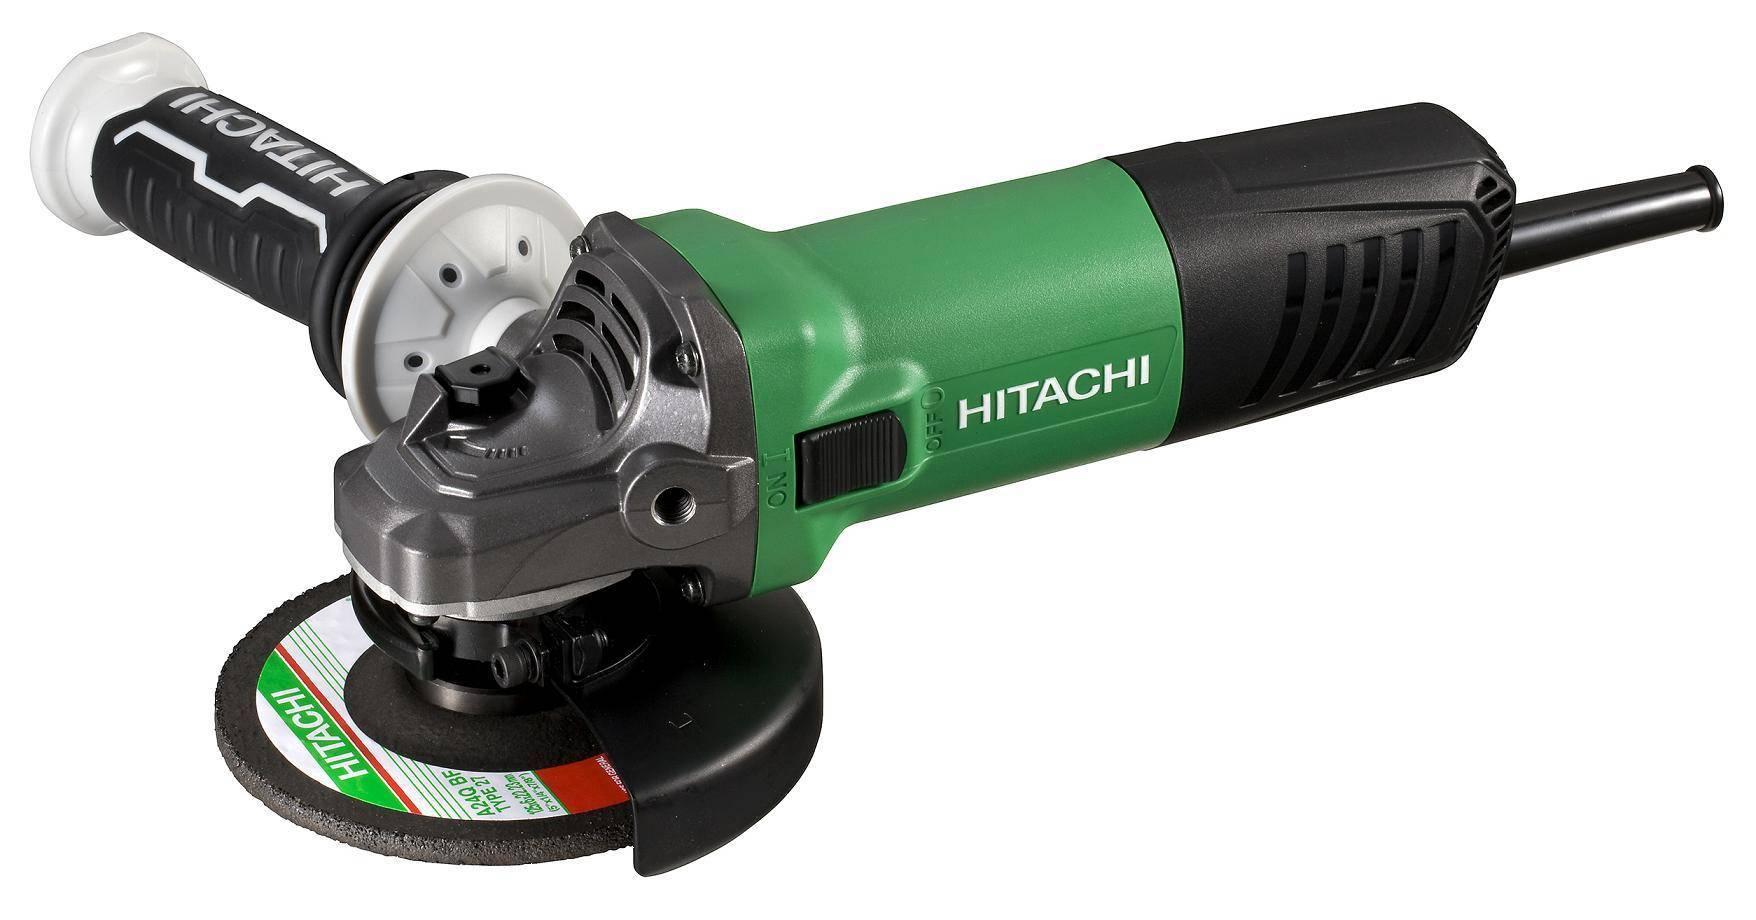 УШМ (болгарка) Hitachi G12sw-nu ушм болгарка hitachi g13sr4 nu